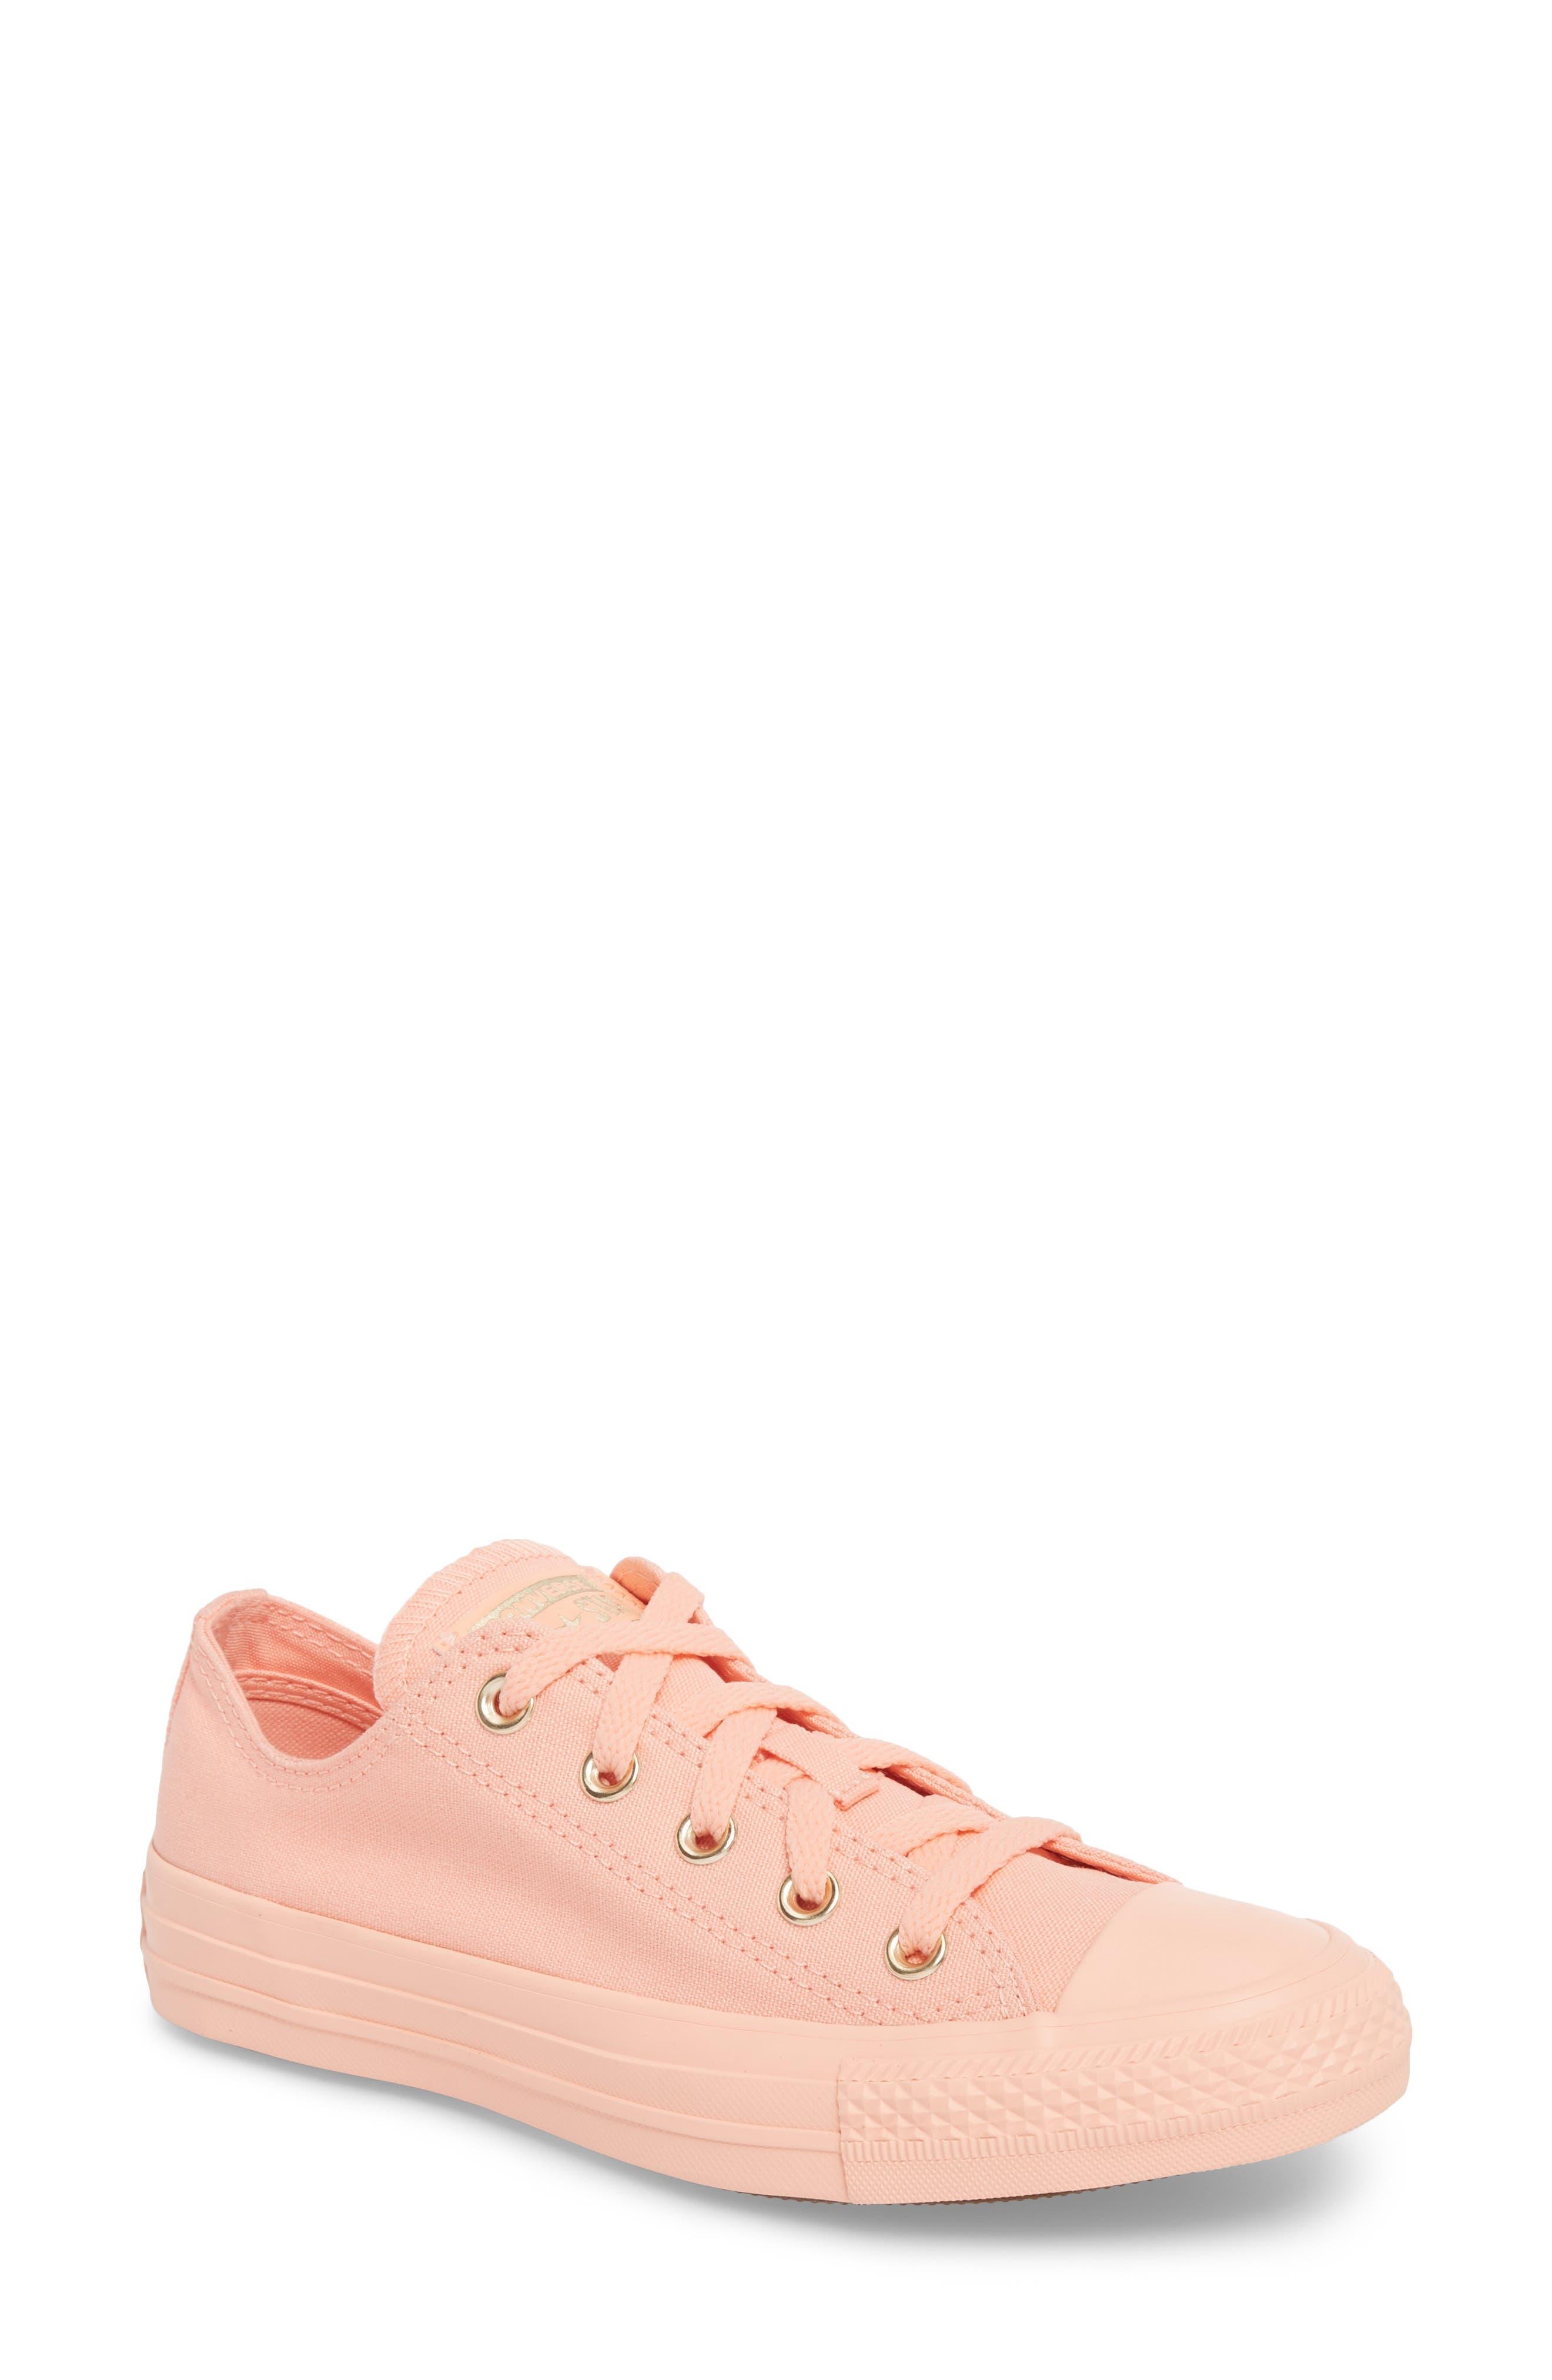 Chuck Taylor<sup>®</sup> All Star<sup>®</sup> Seasonal Color Sneaker,                         Main,                         color,